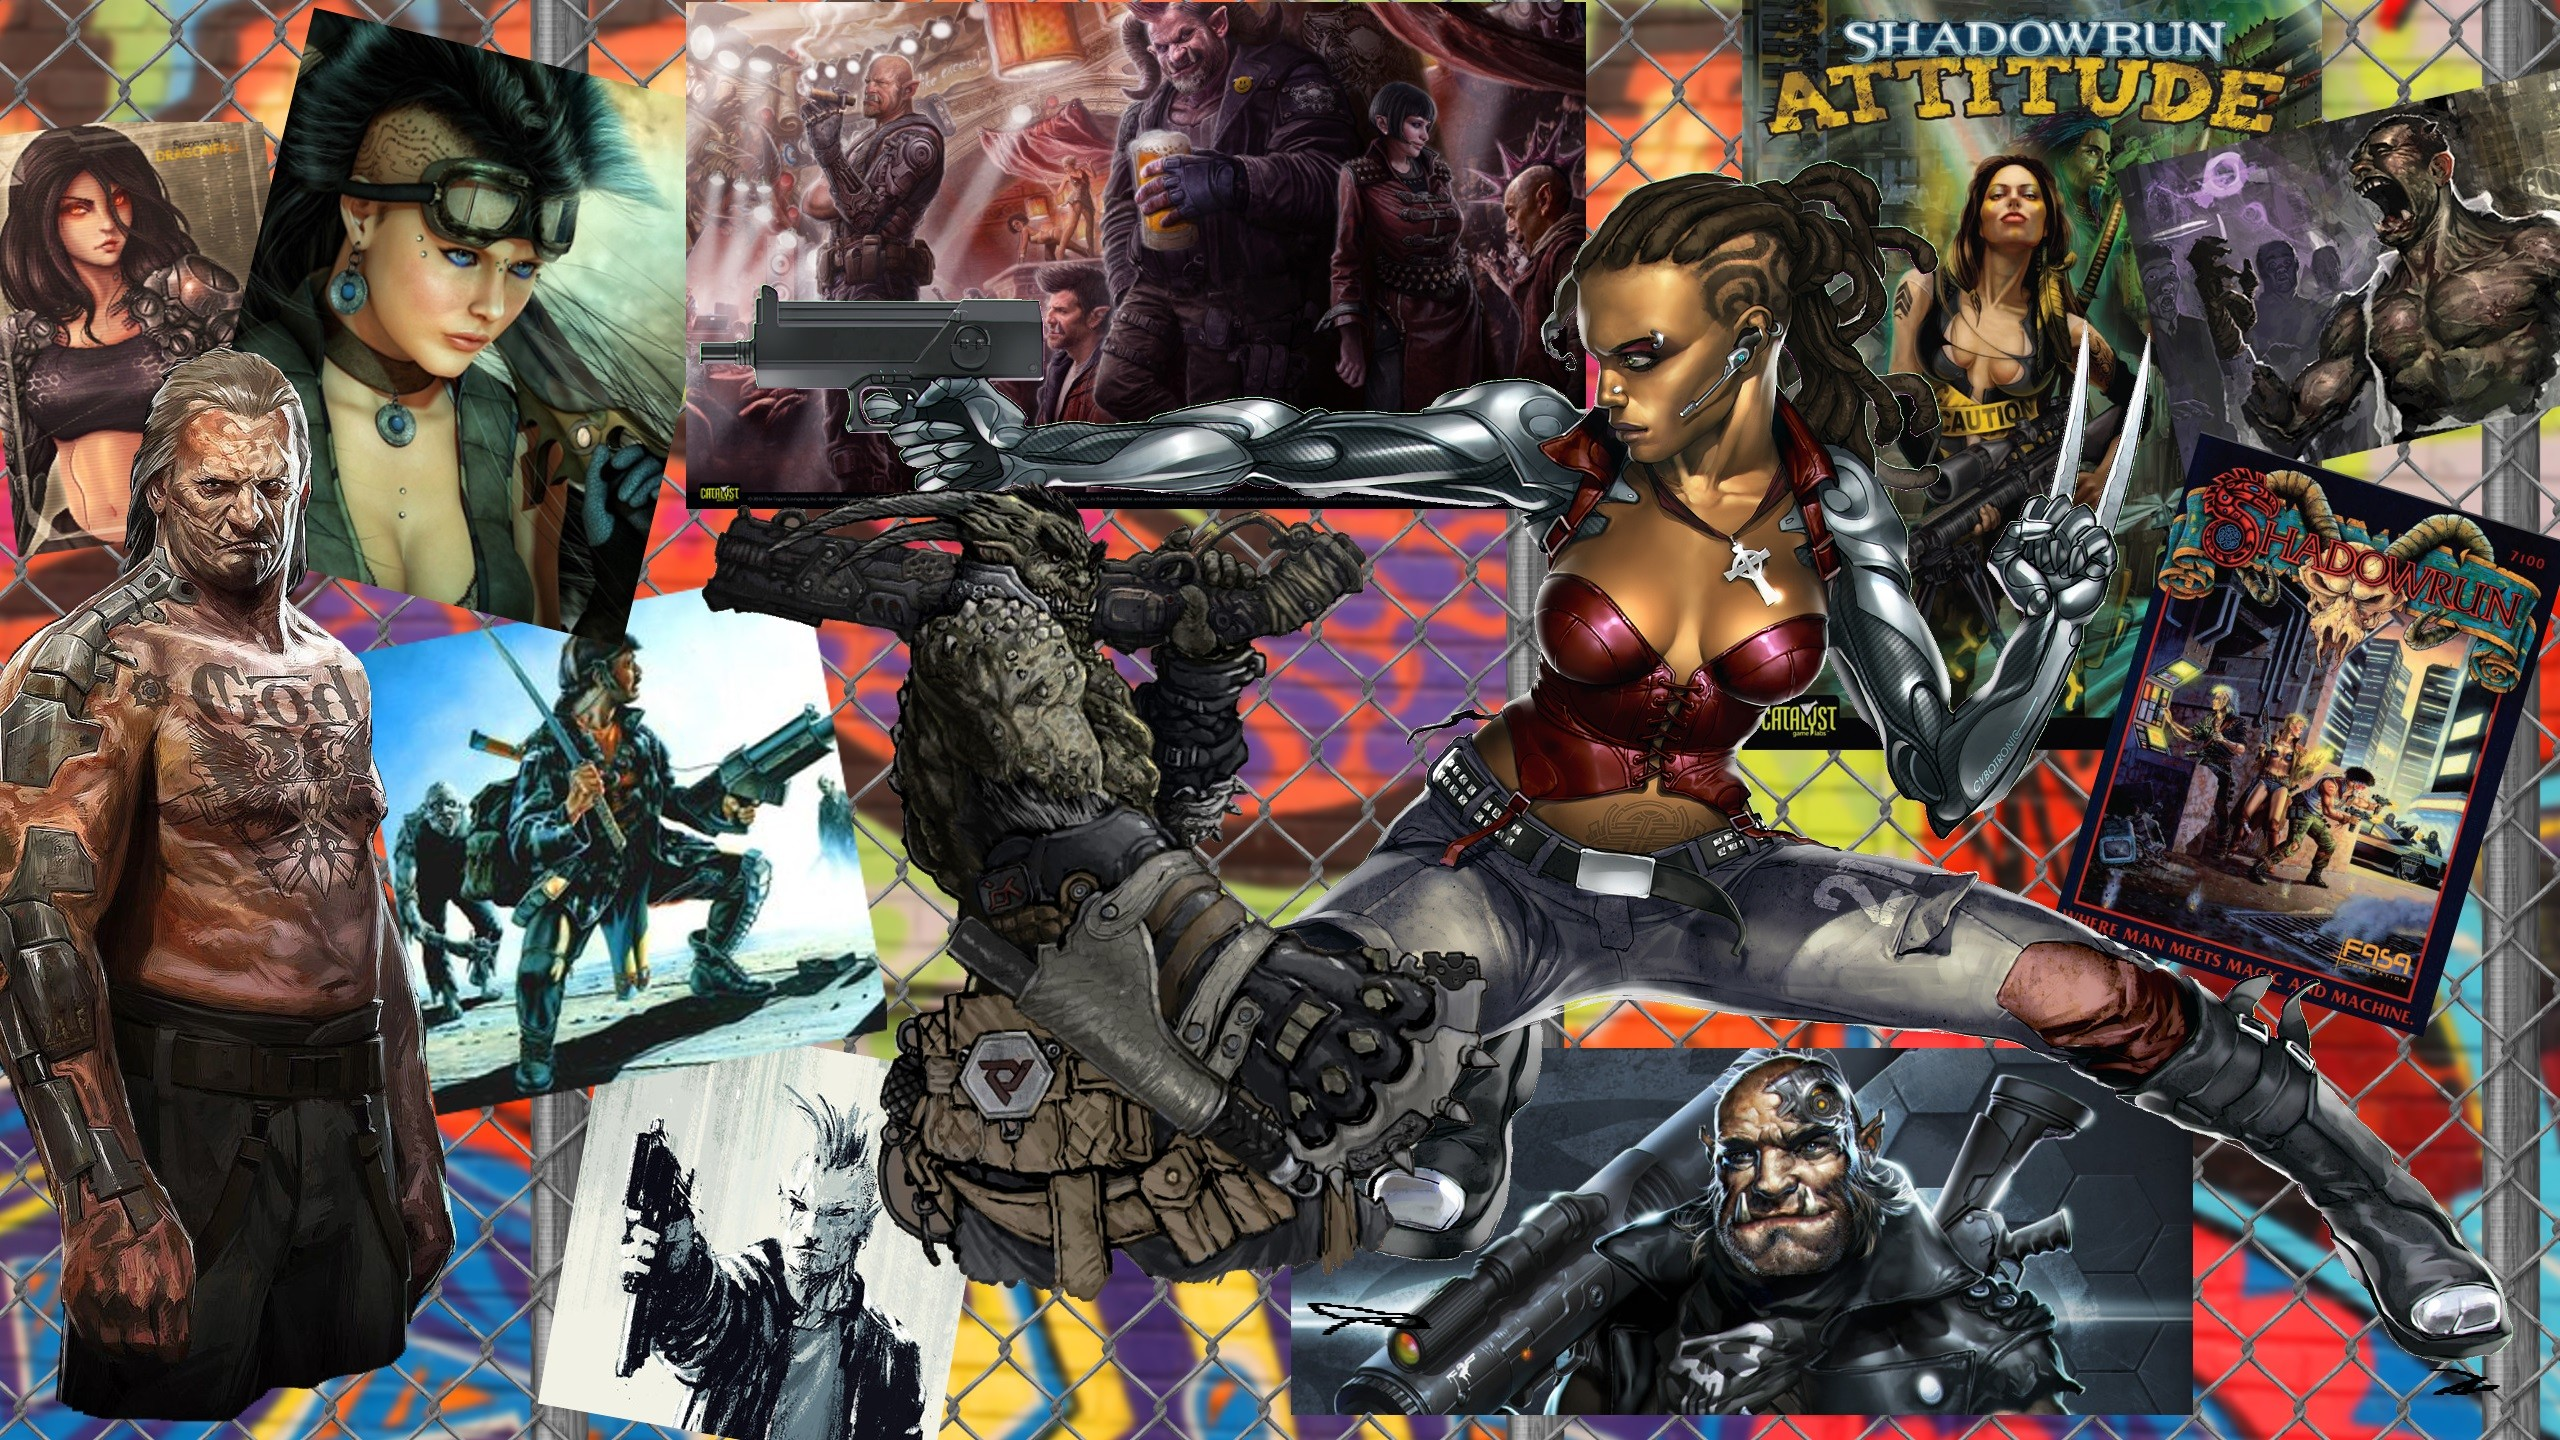 Sci Fi – Cyberpunk Shadowrun Woman Gun Troll Collage Orc Wallpaper